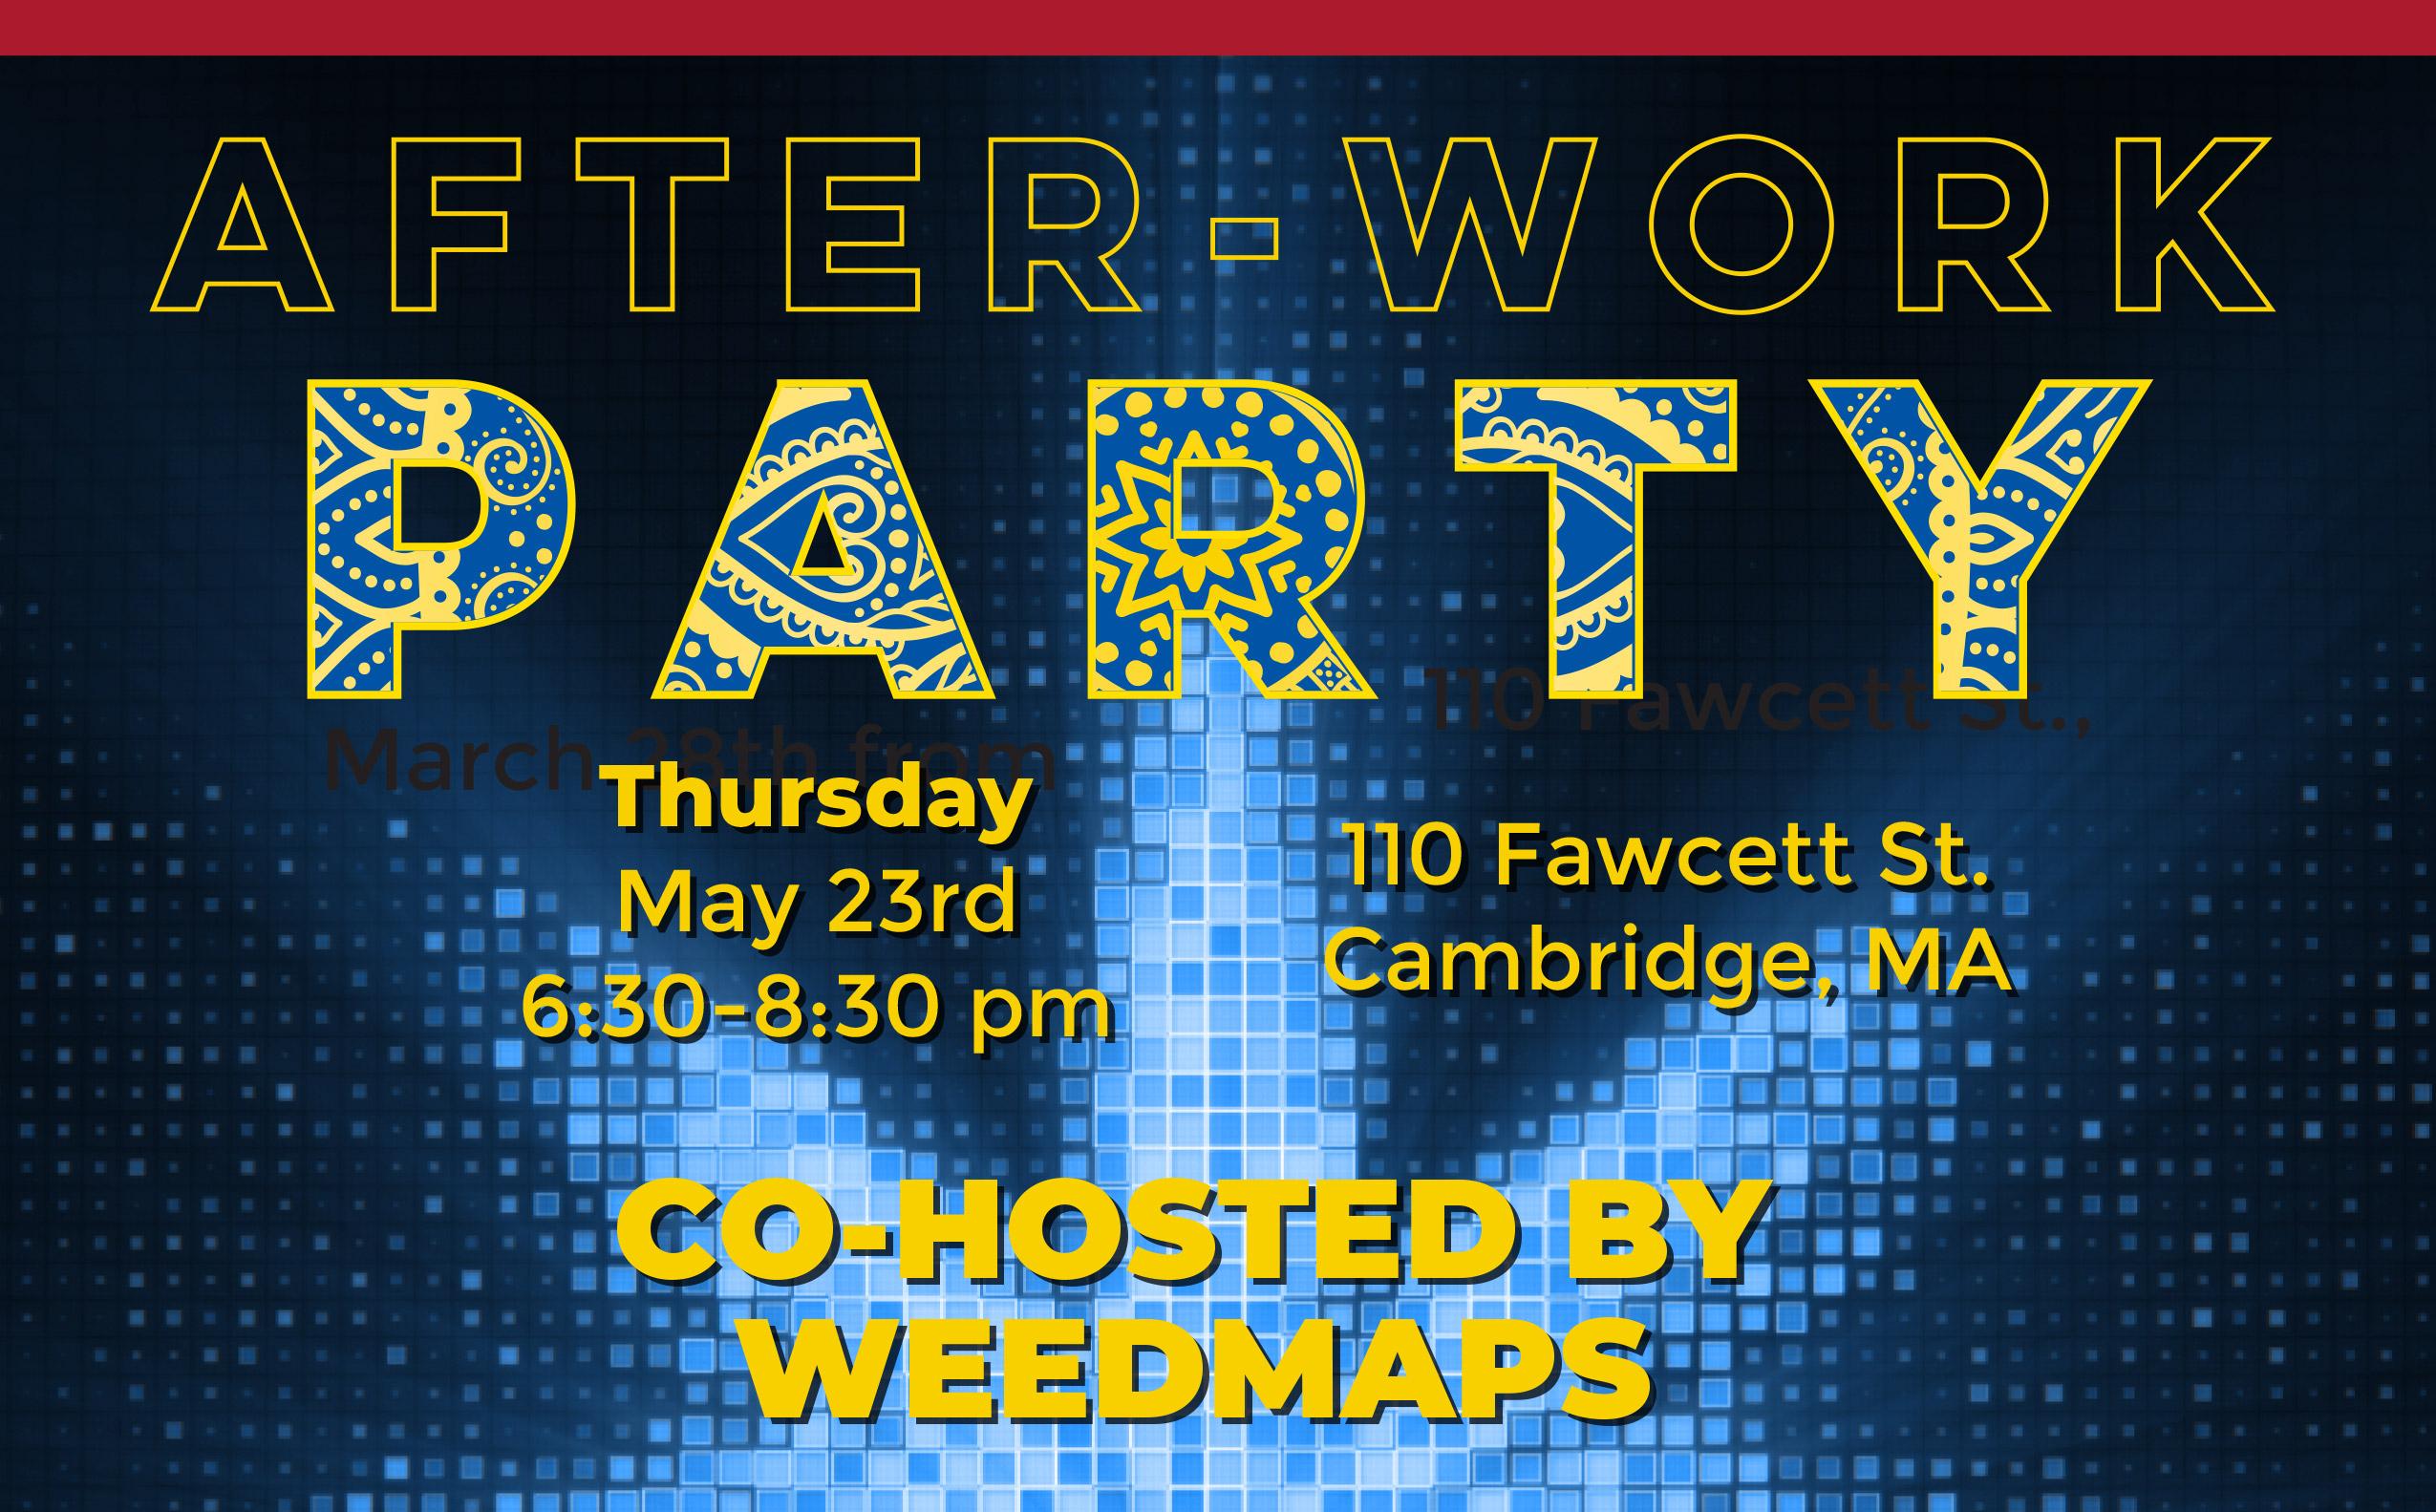 After Work Party @ 110 Fawcett St  | Revolutionary Clinics